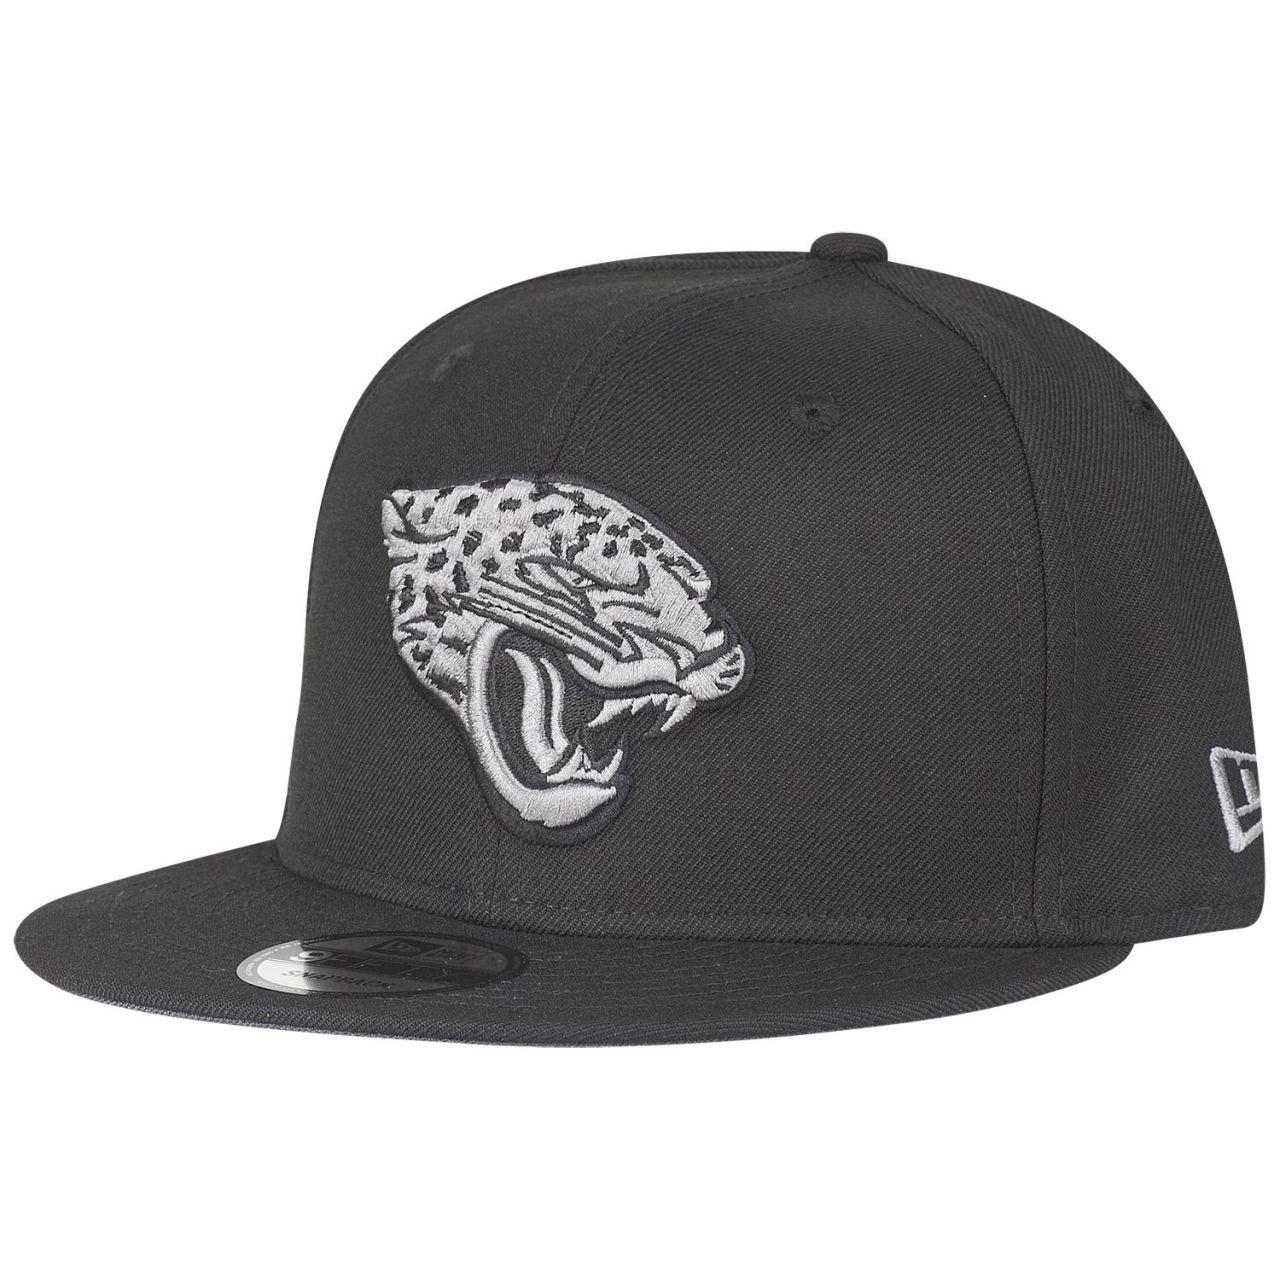 amfoo - New Era 9Fifty Snapback Cap - Jacksonville Jaguars schwarz